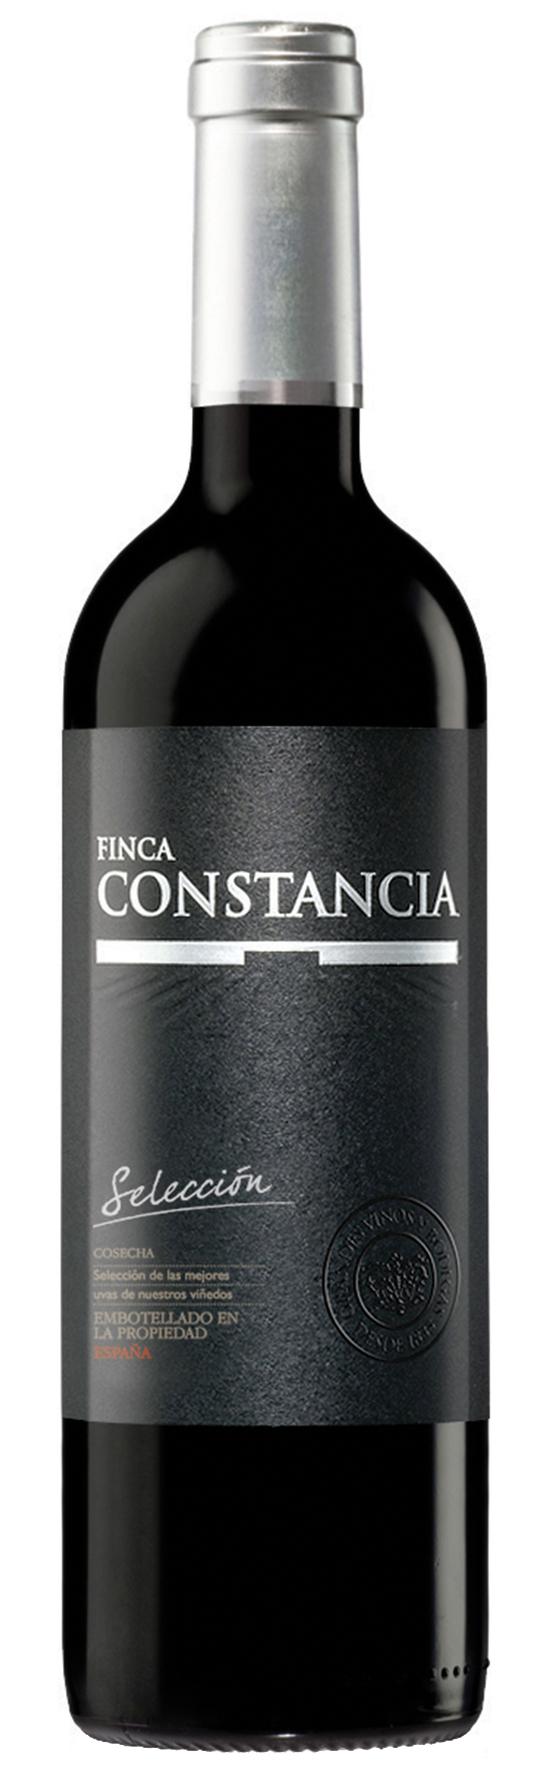 Selección 2014 Finca Constancia DO Kastilien-La Mancha